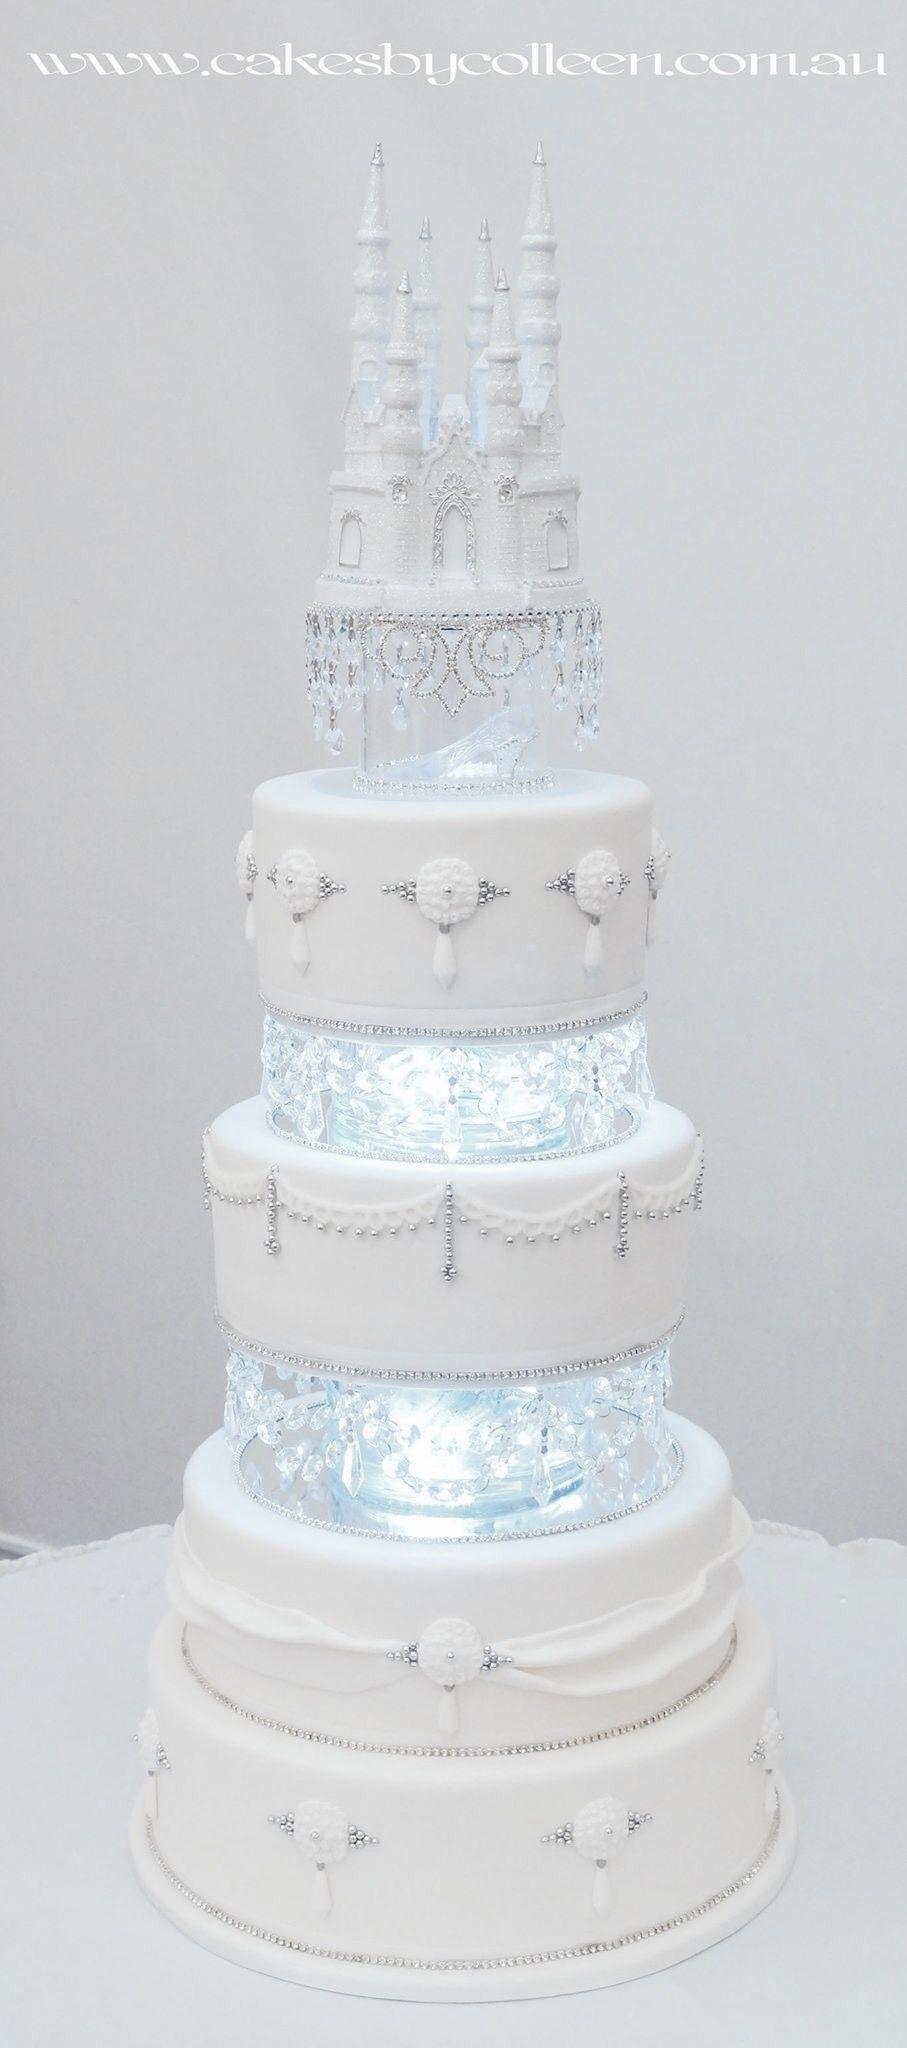 4 Tier Cinderella Themed Wedding Cake Cinderella Castle Slipper